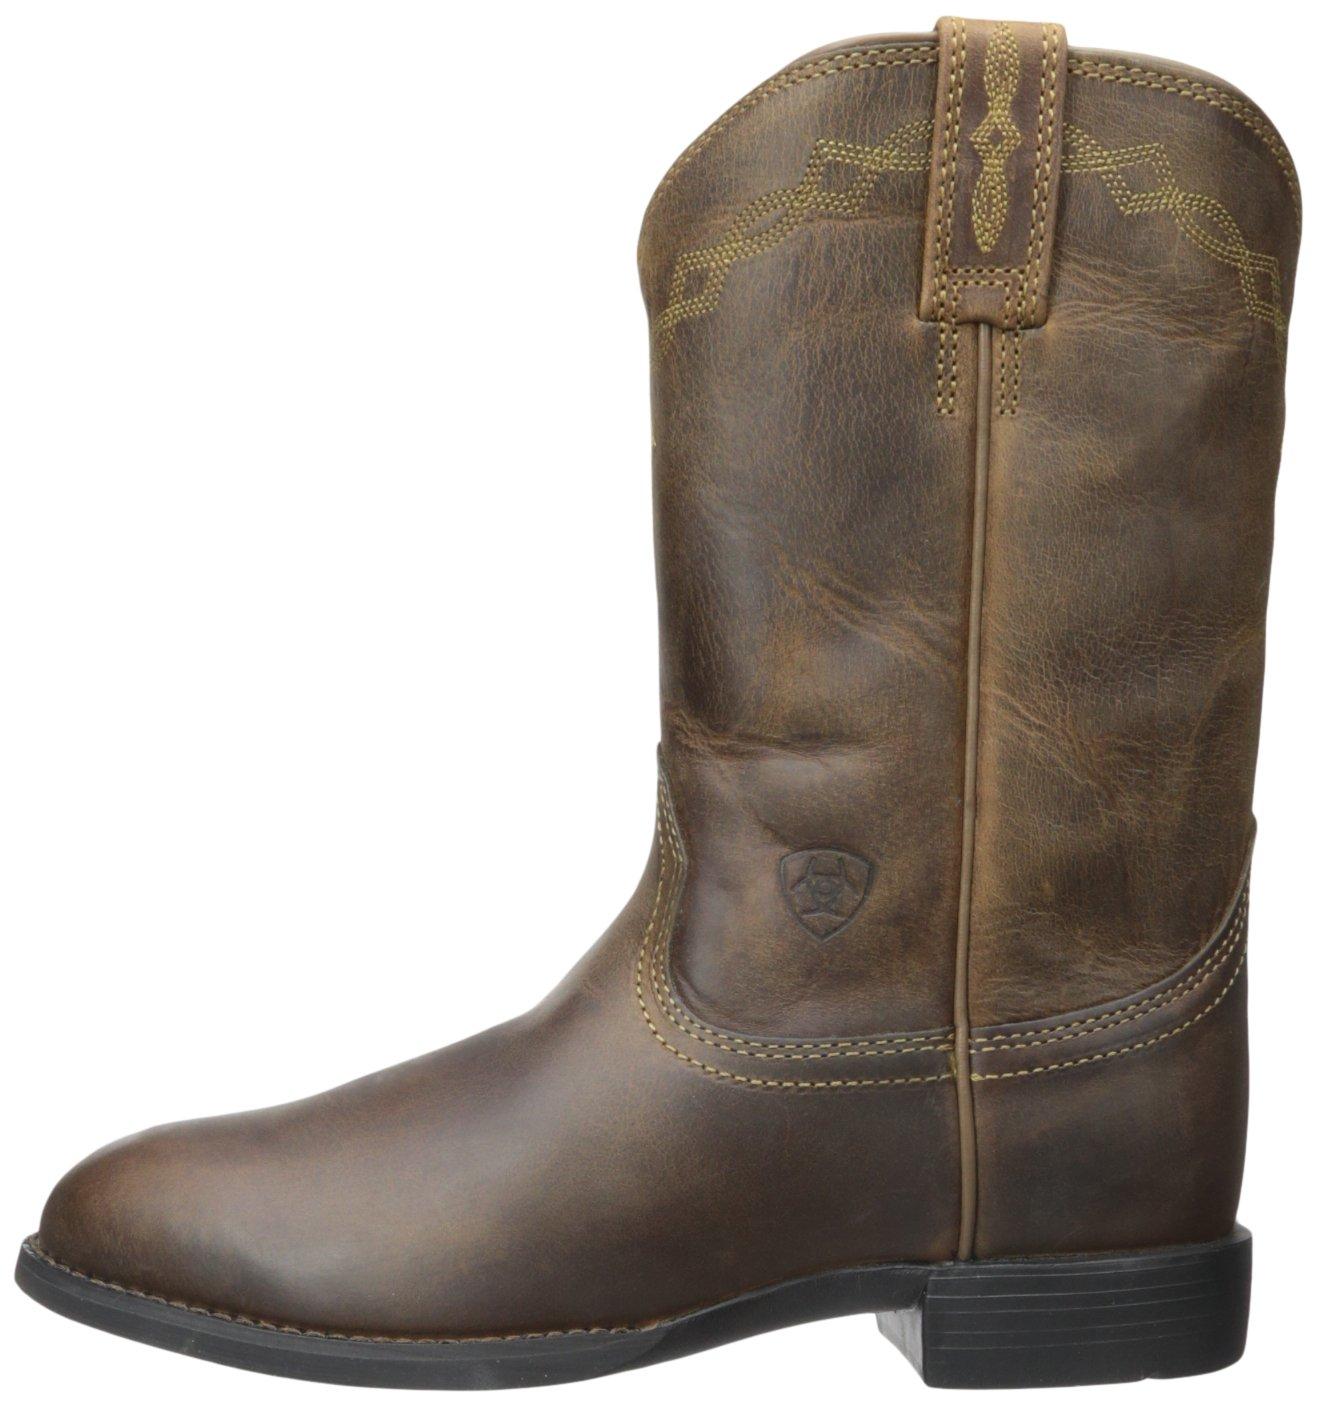 Ariat Boot Women's Heritage Roper Western Cowboy Boot Ariat B005064QOA 6 MW|Distressed Brown fc4601